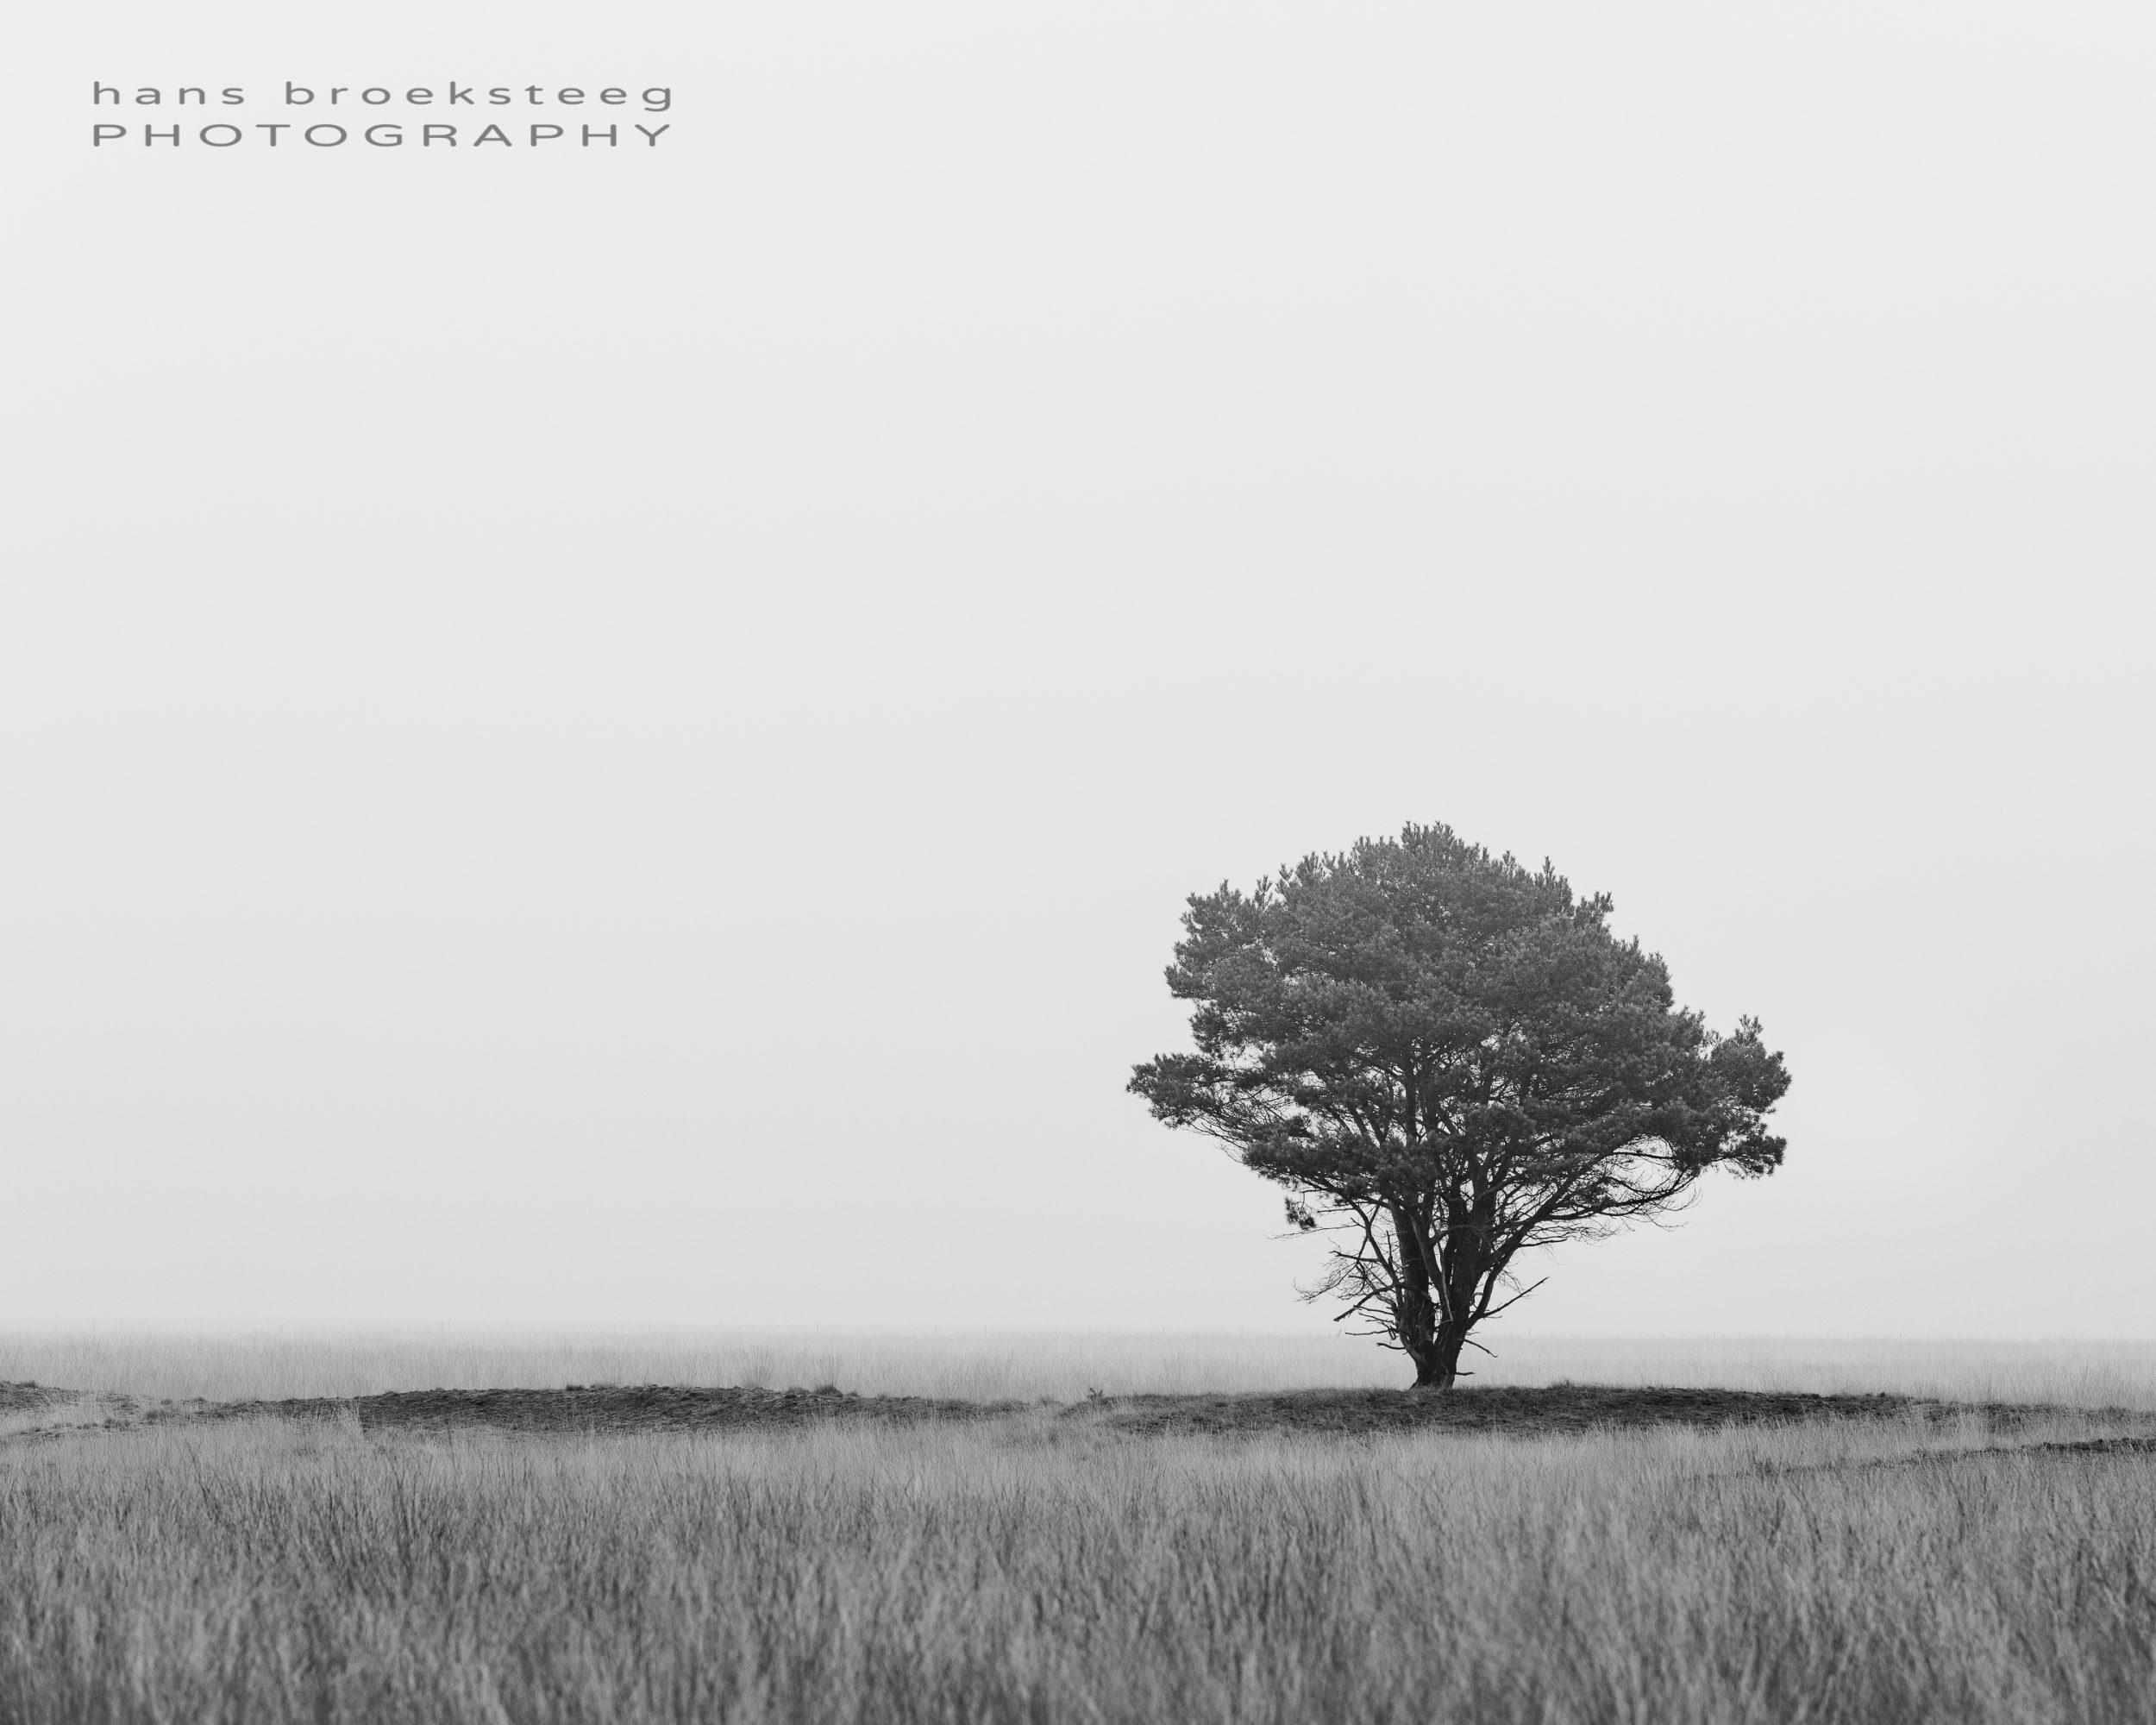 Lone line tree